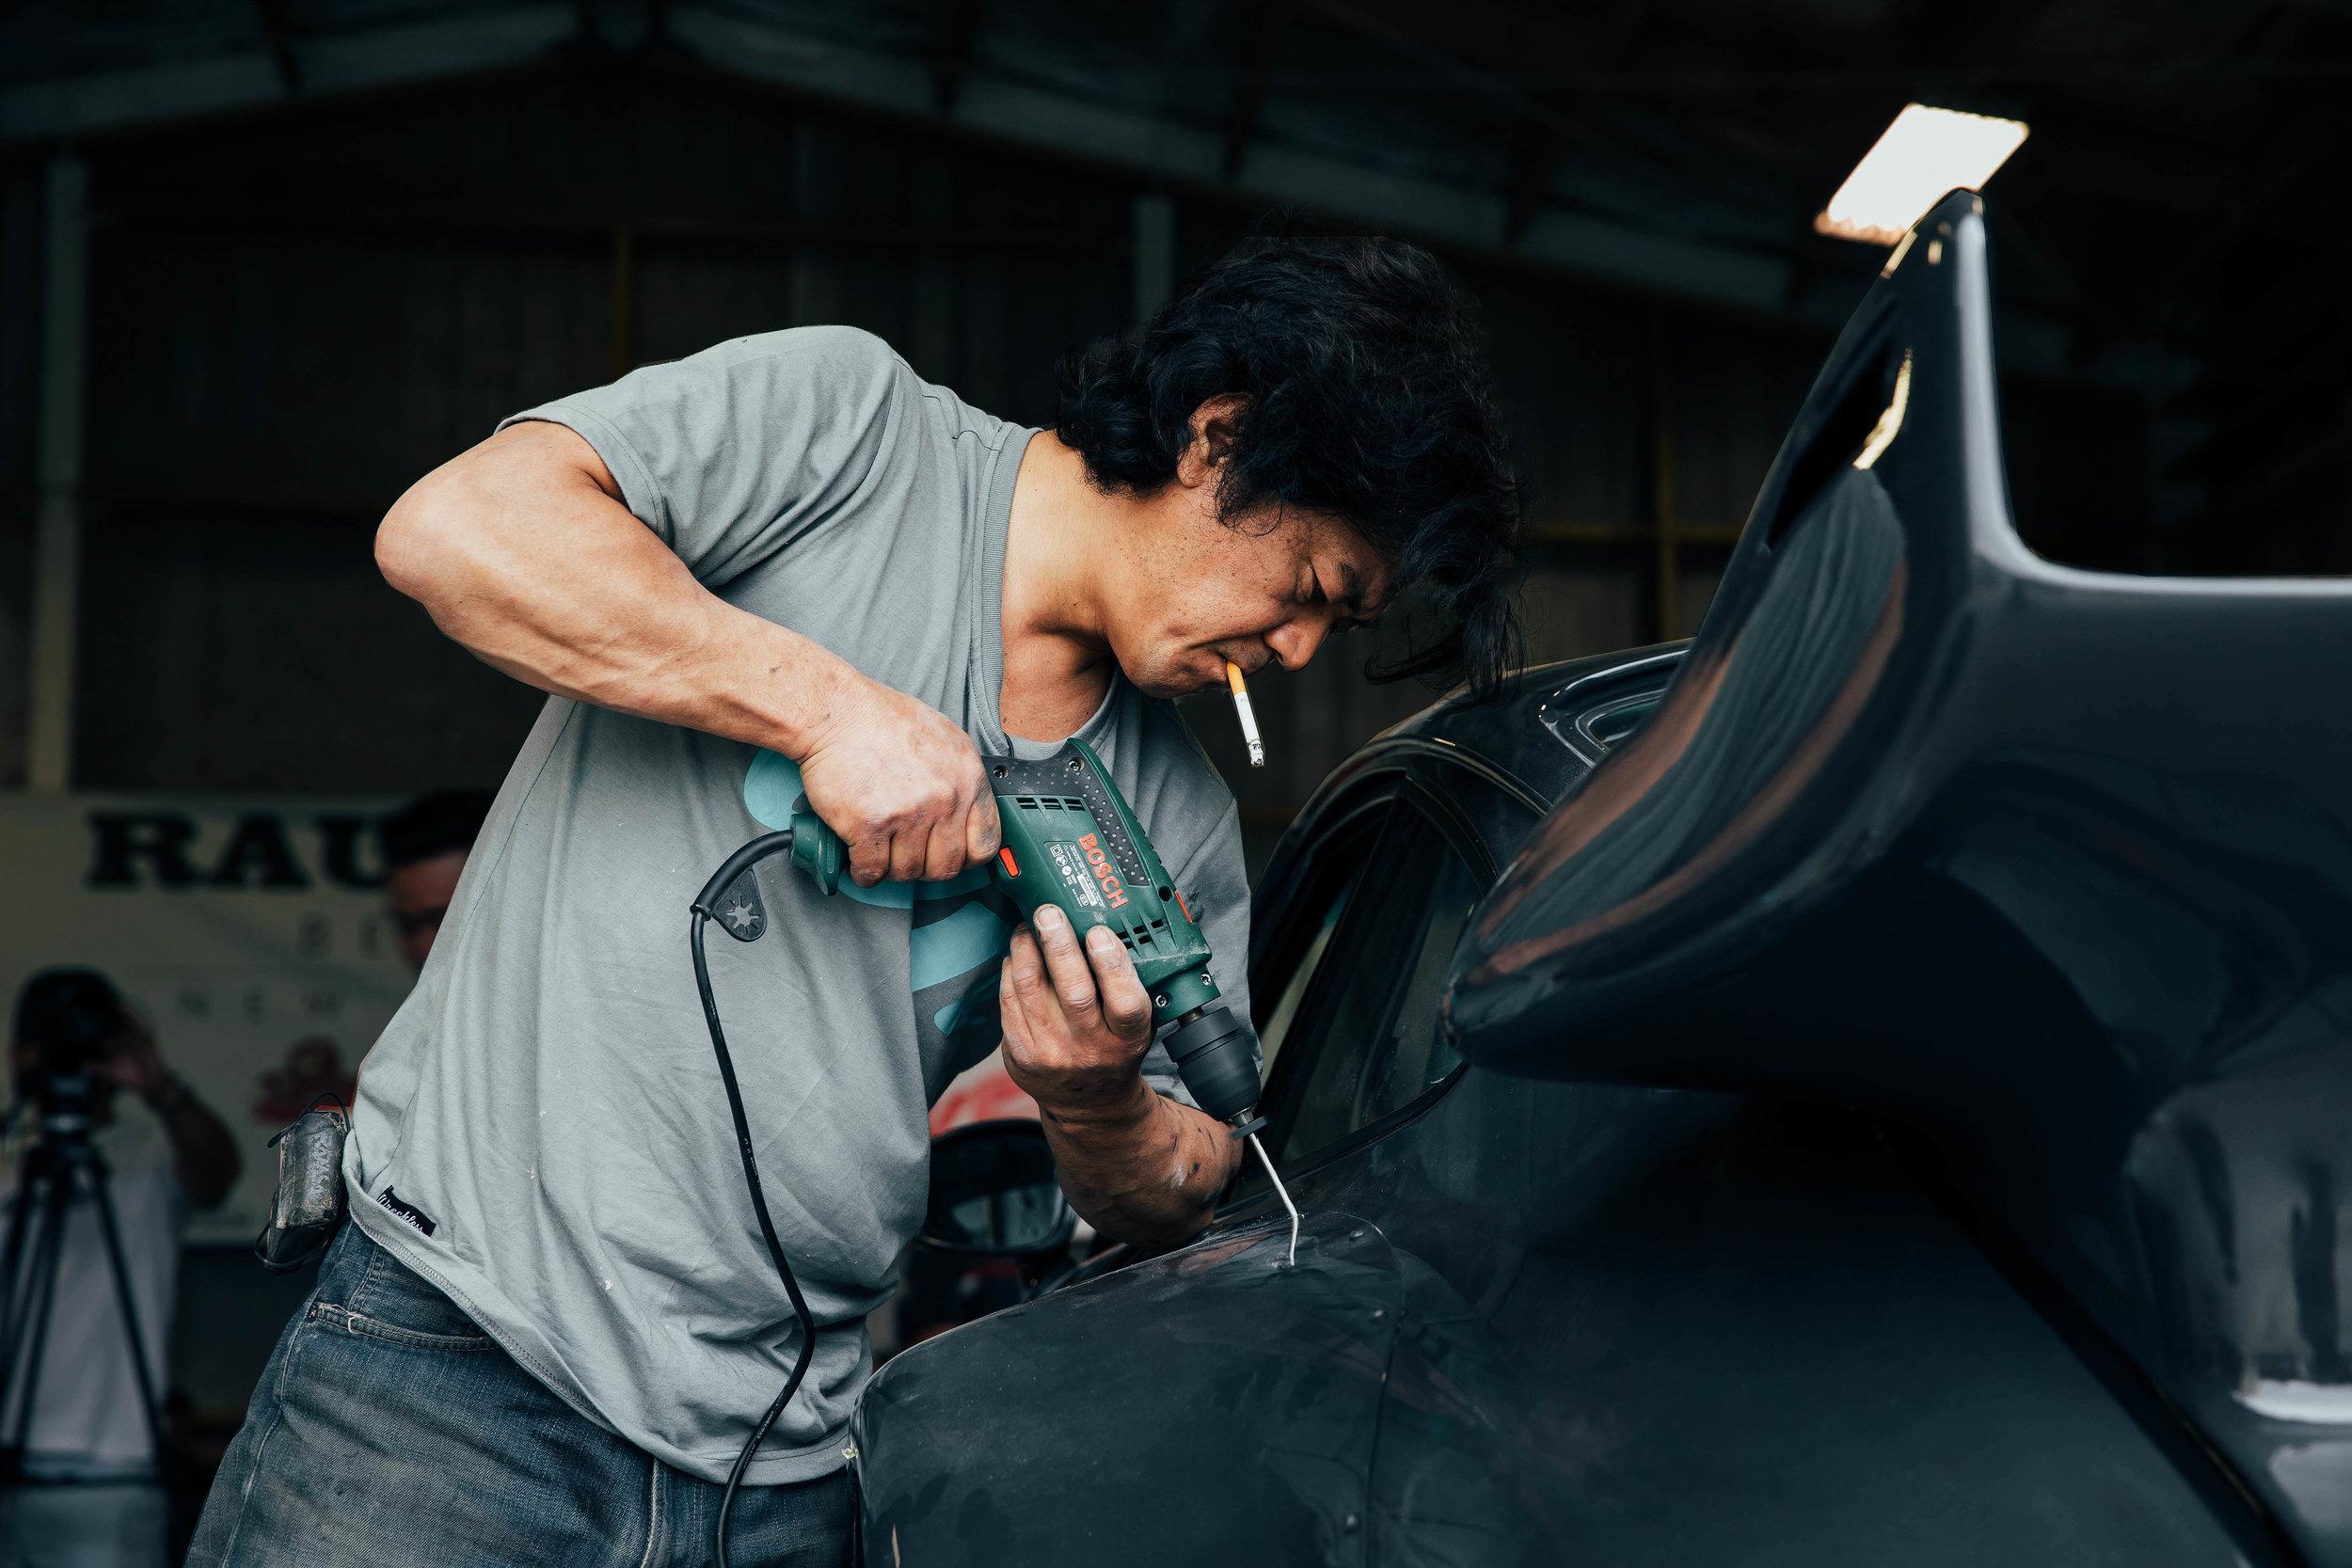 Nakai-san working on 'Waikato' in New Zealand.